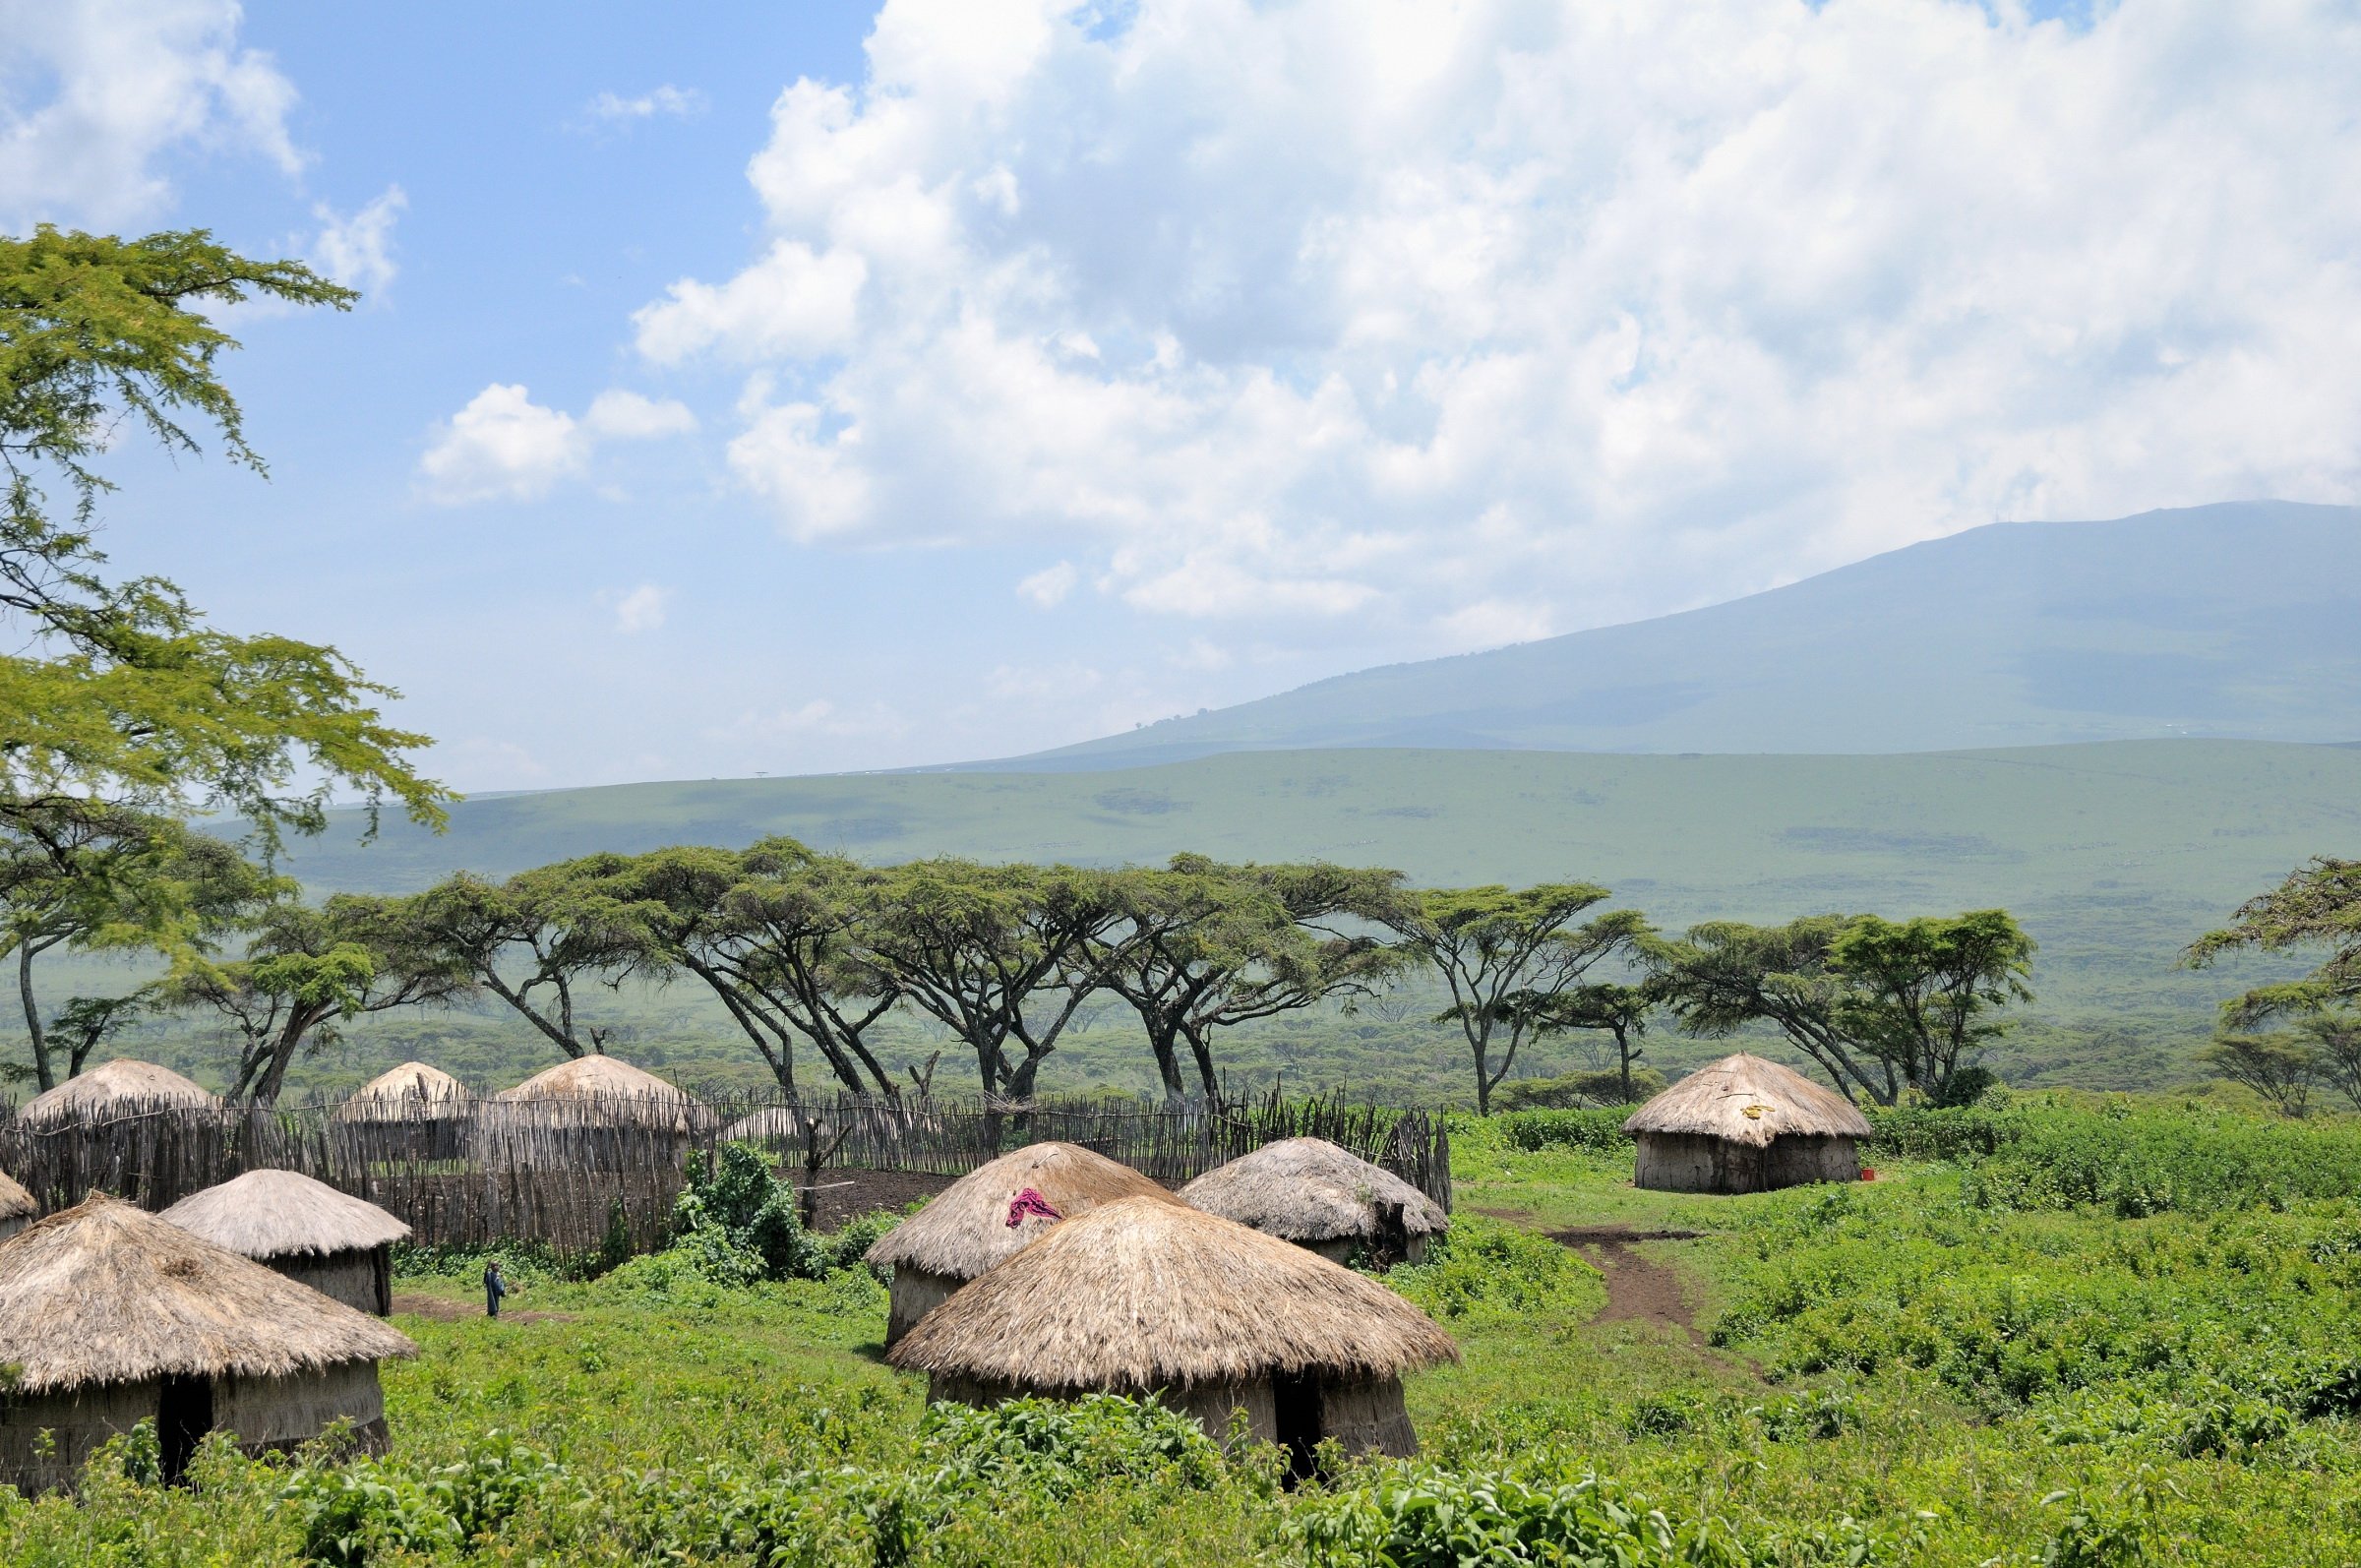 Maasai_boma_in_Ngorongoro_Conservation_Area